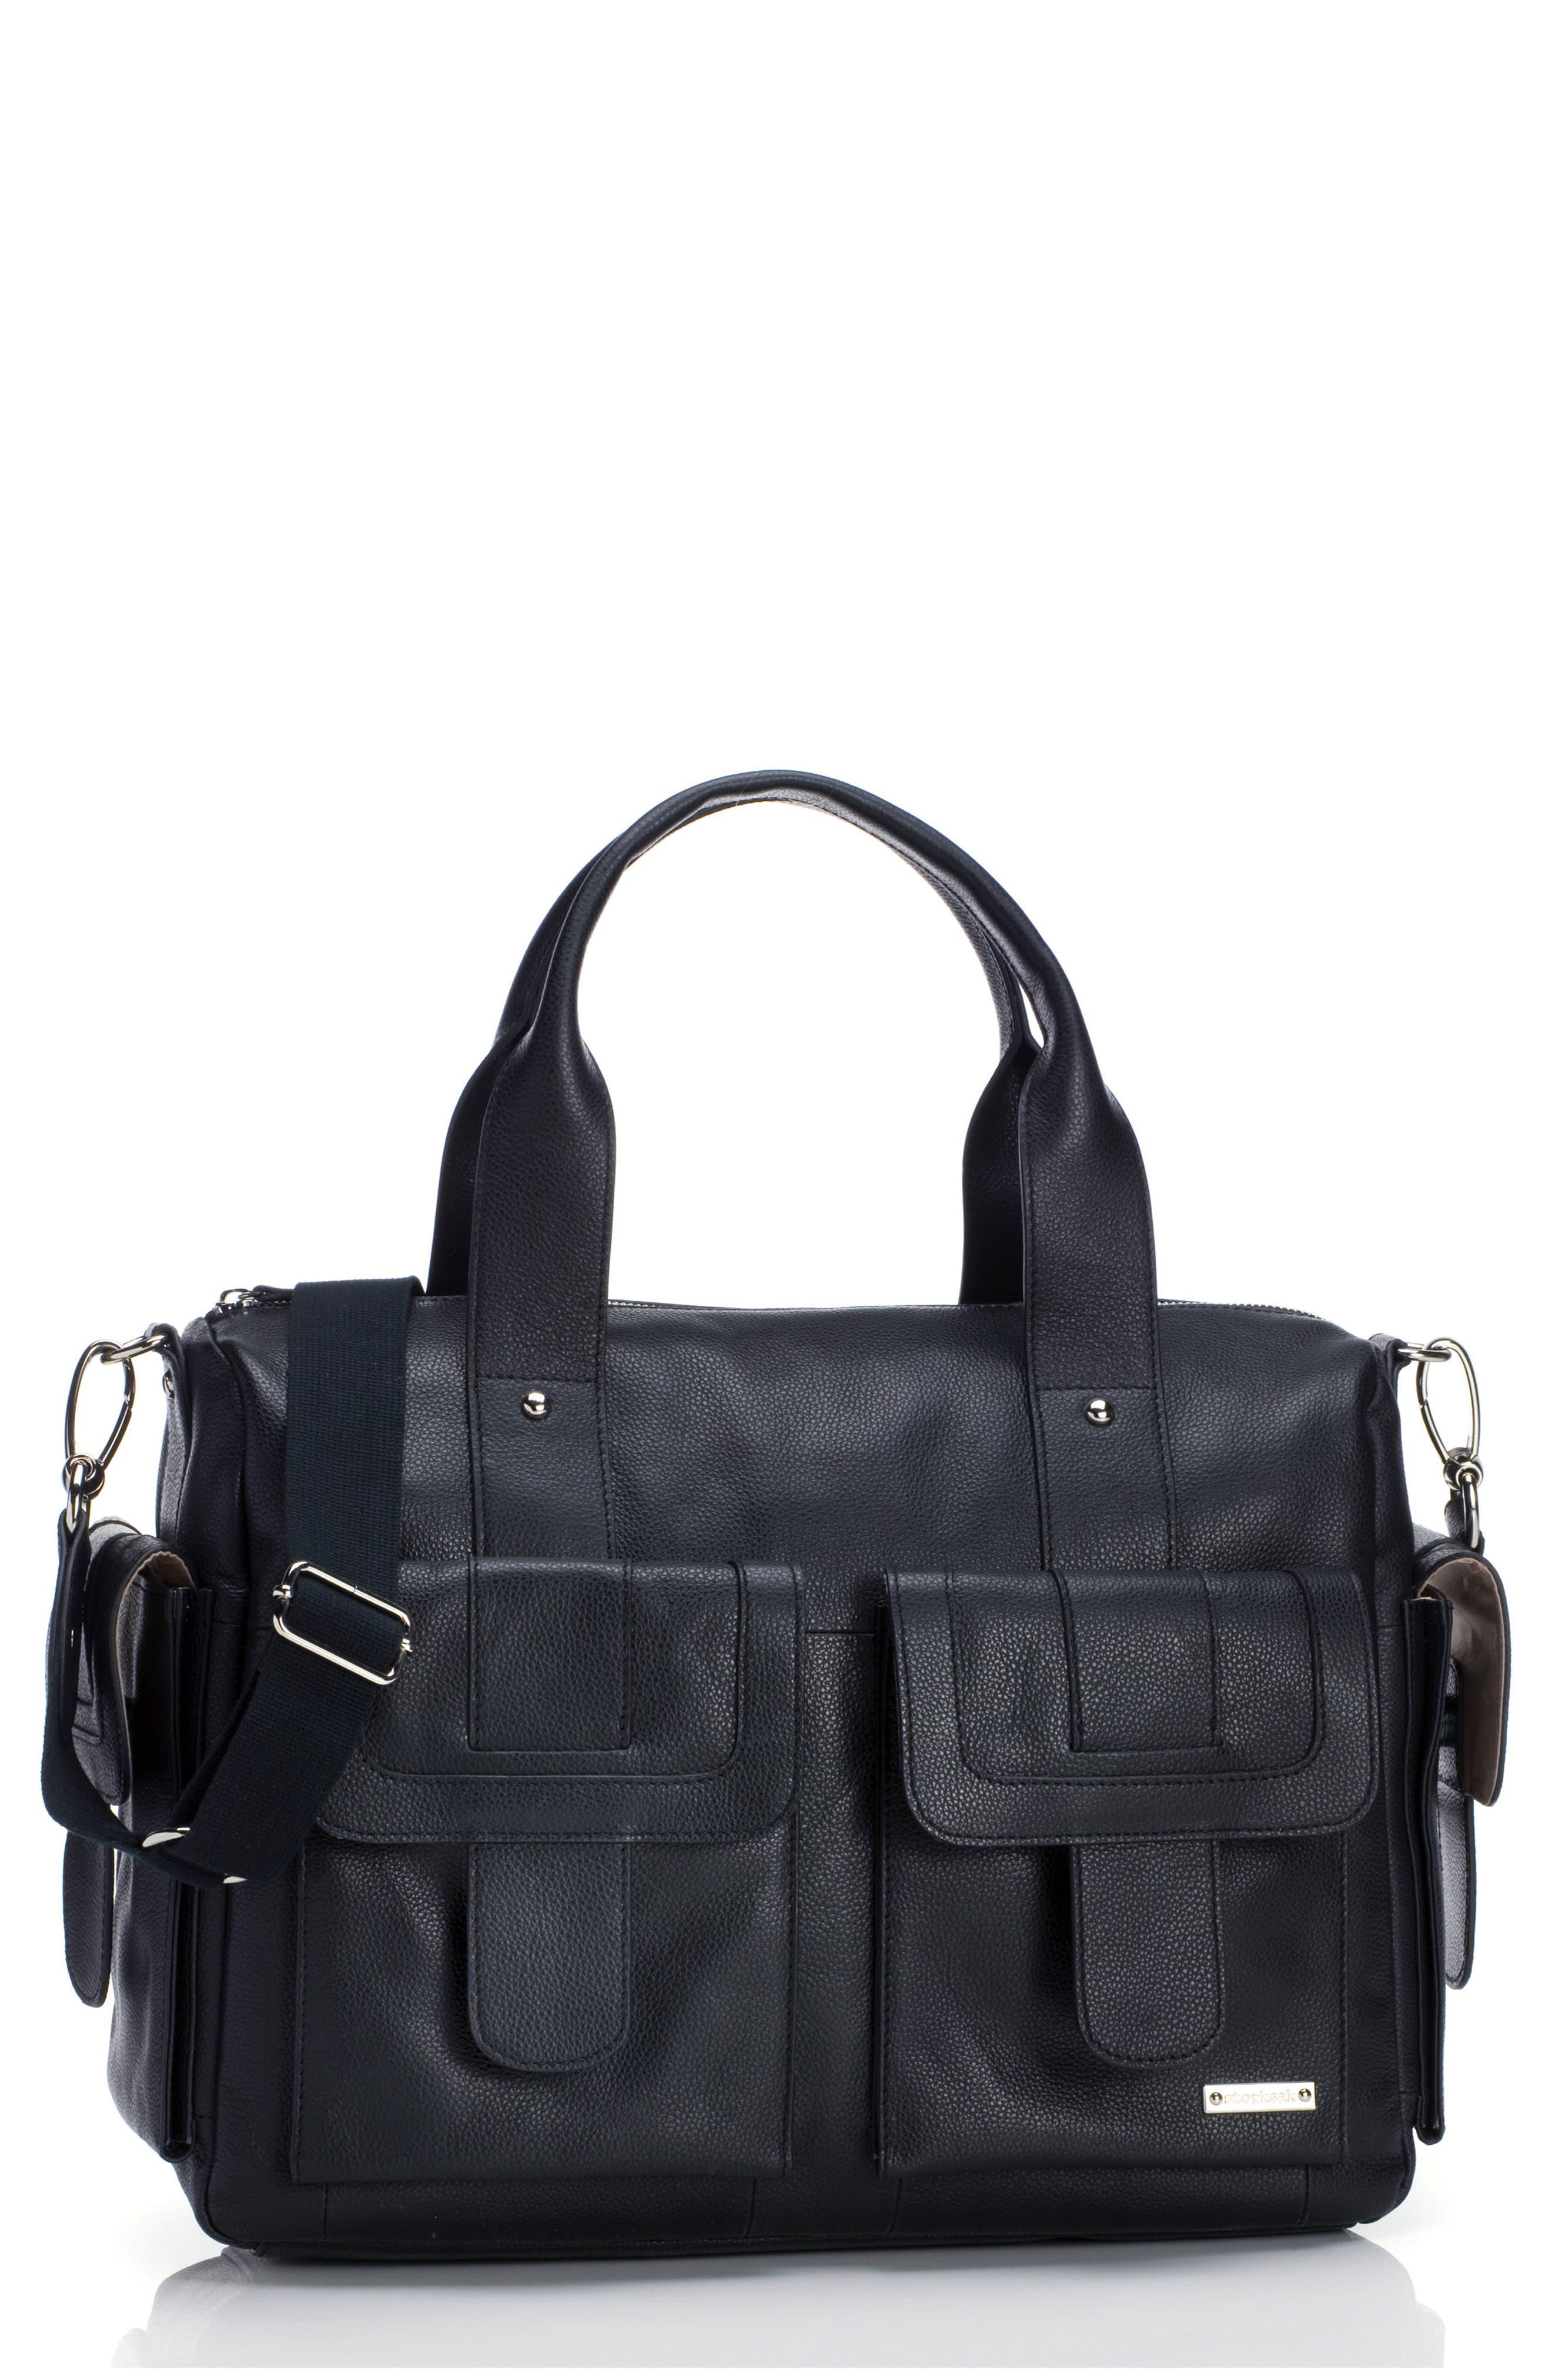 Alternate Image 1 Selected - Storsak 'Sofia' Leather Diaper Bag